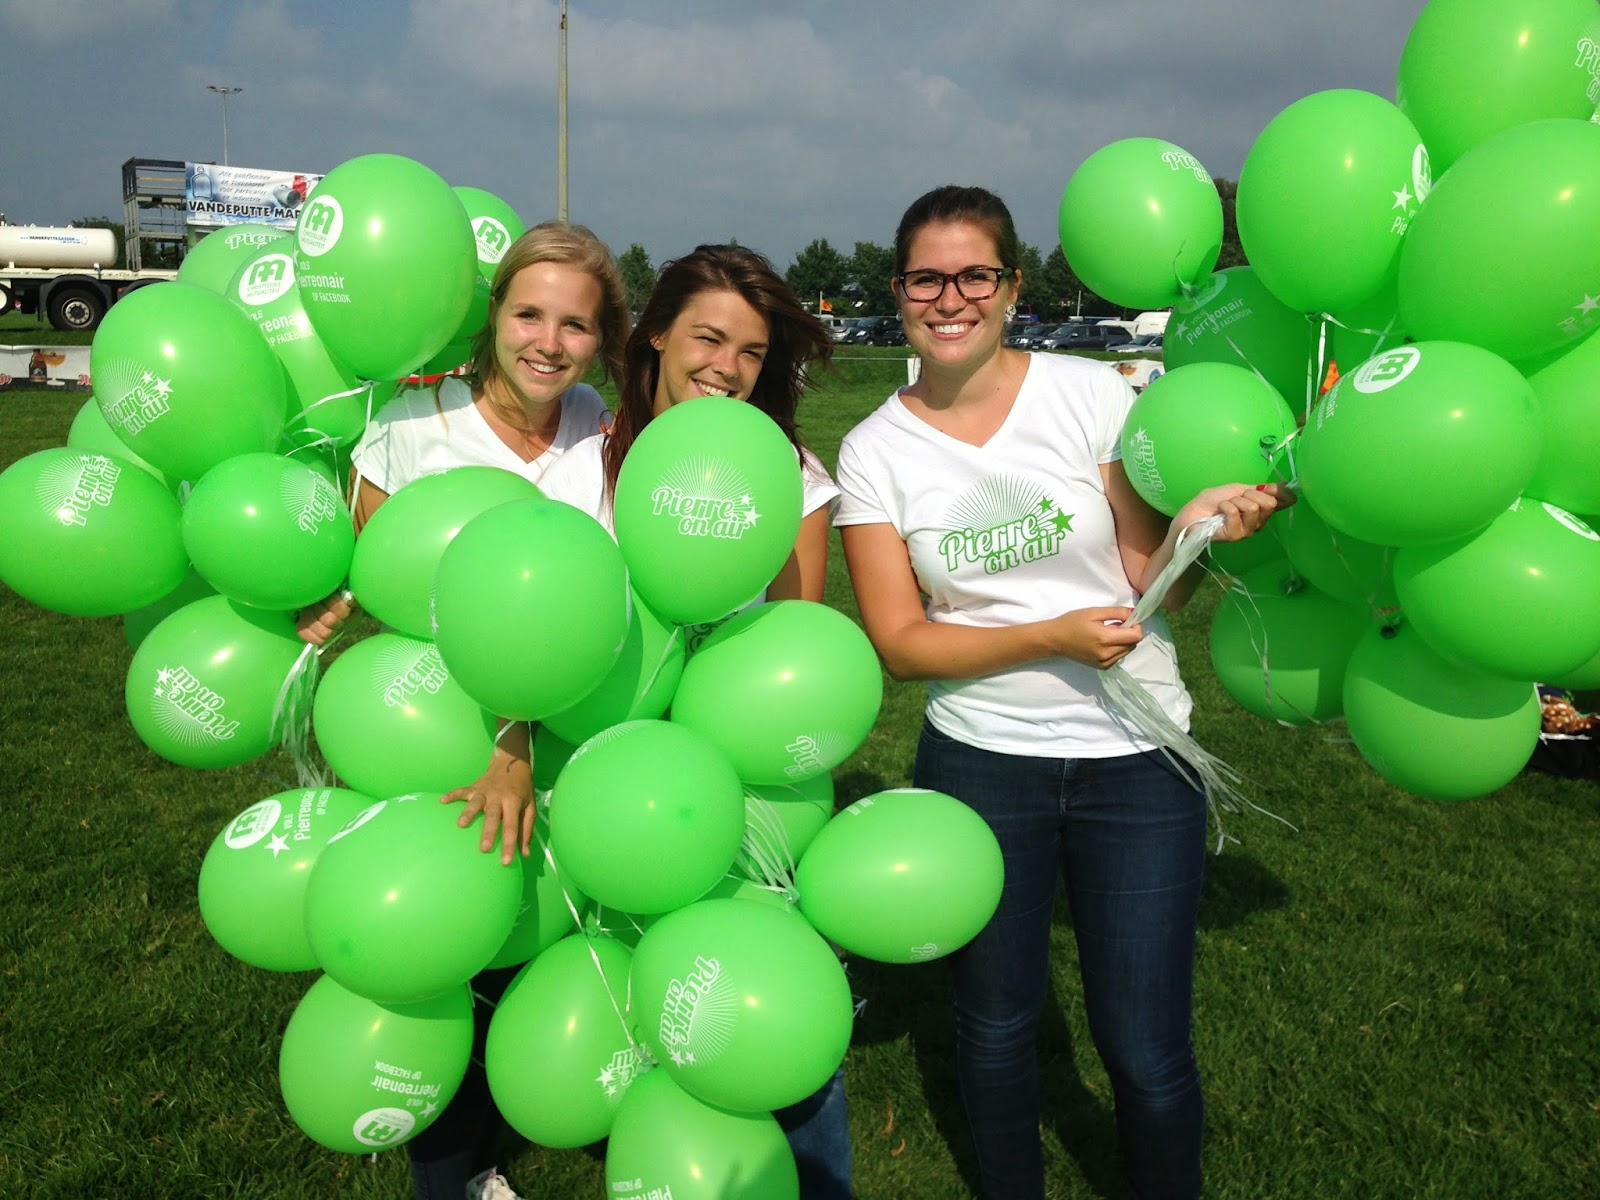 CM Balloonmeeting i.o.v. 24Seven